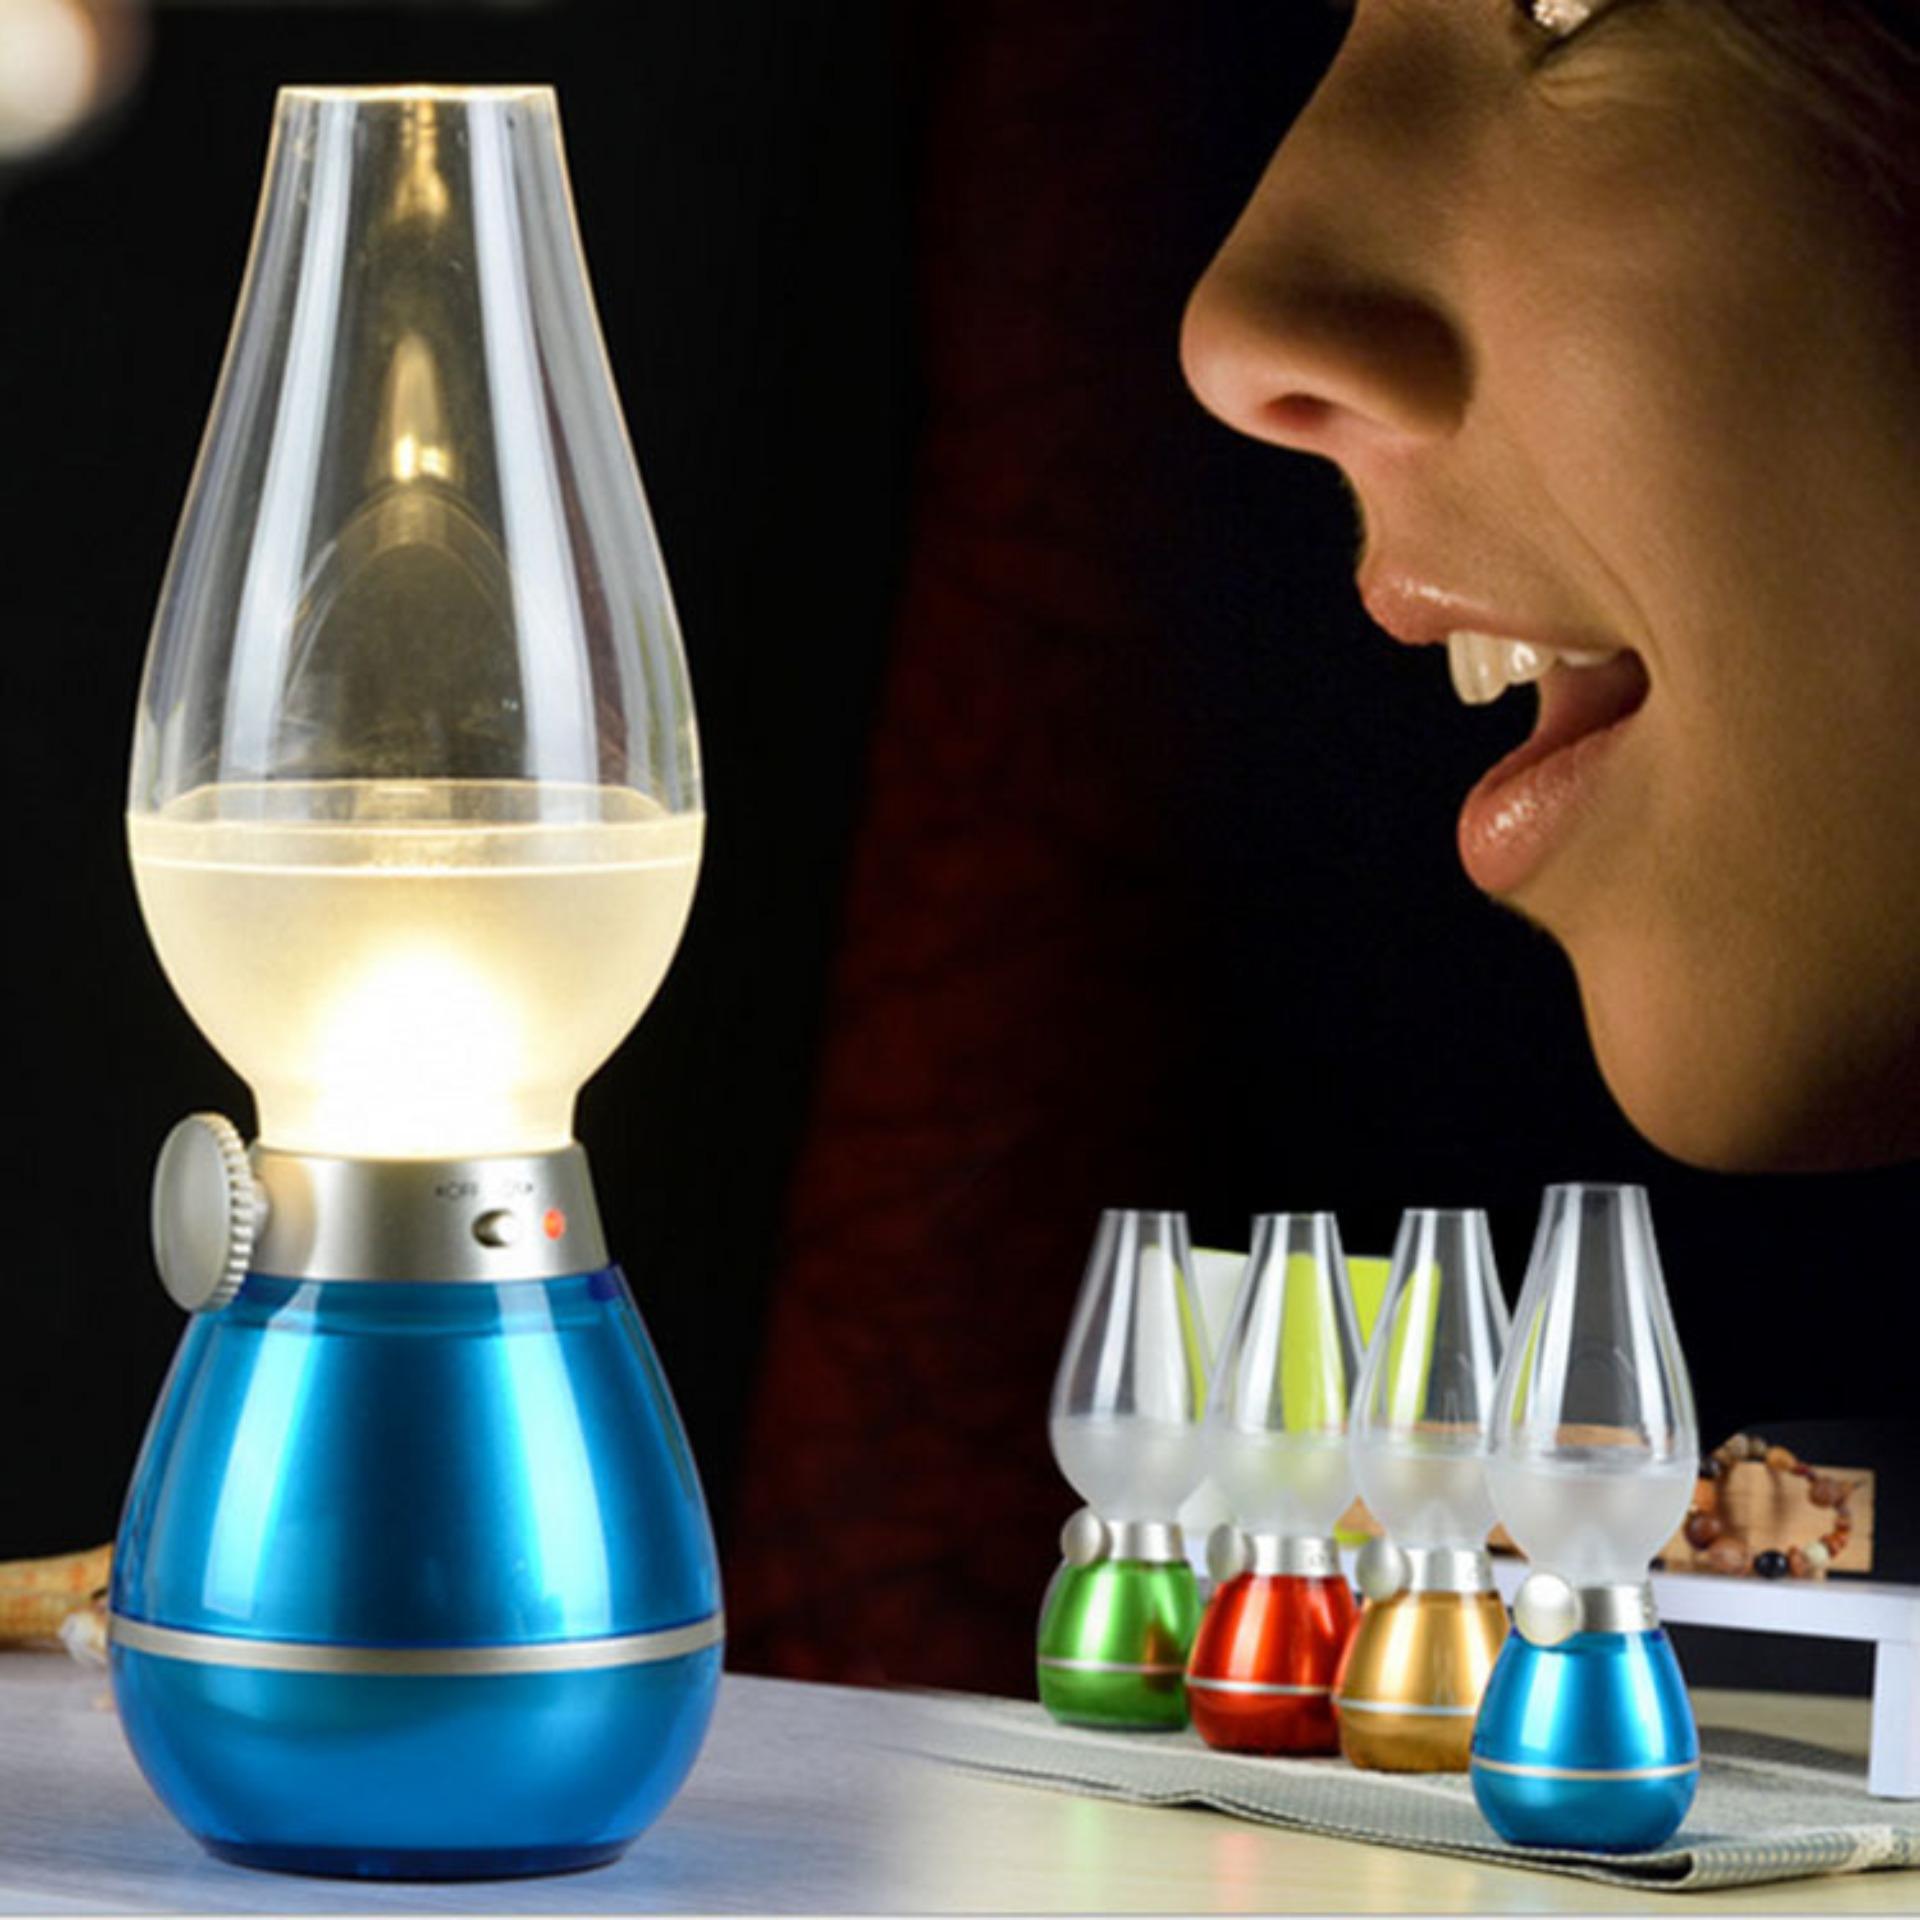 Toko Lampu Tidur Tiup Lampu Aladin Dekat Sini